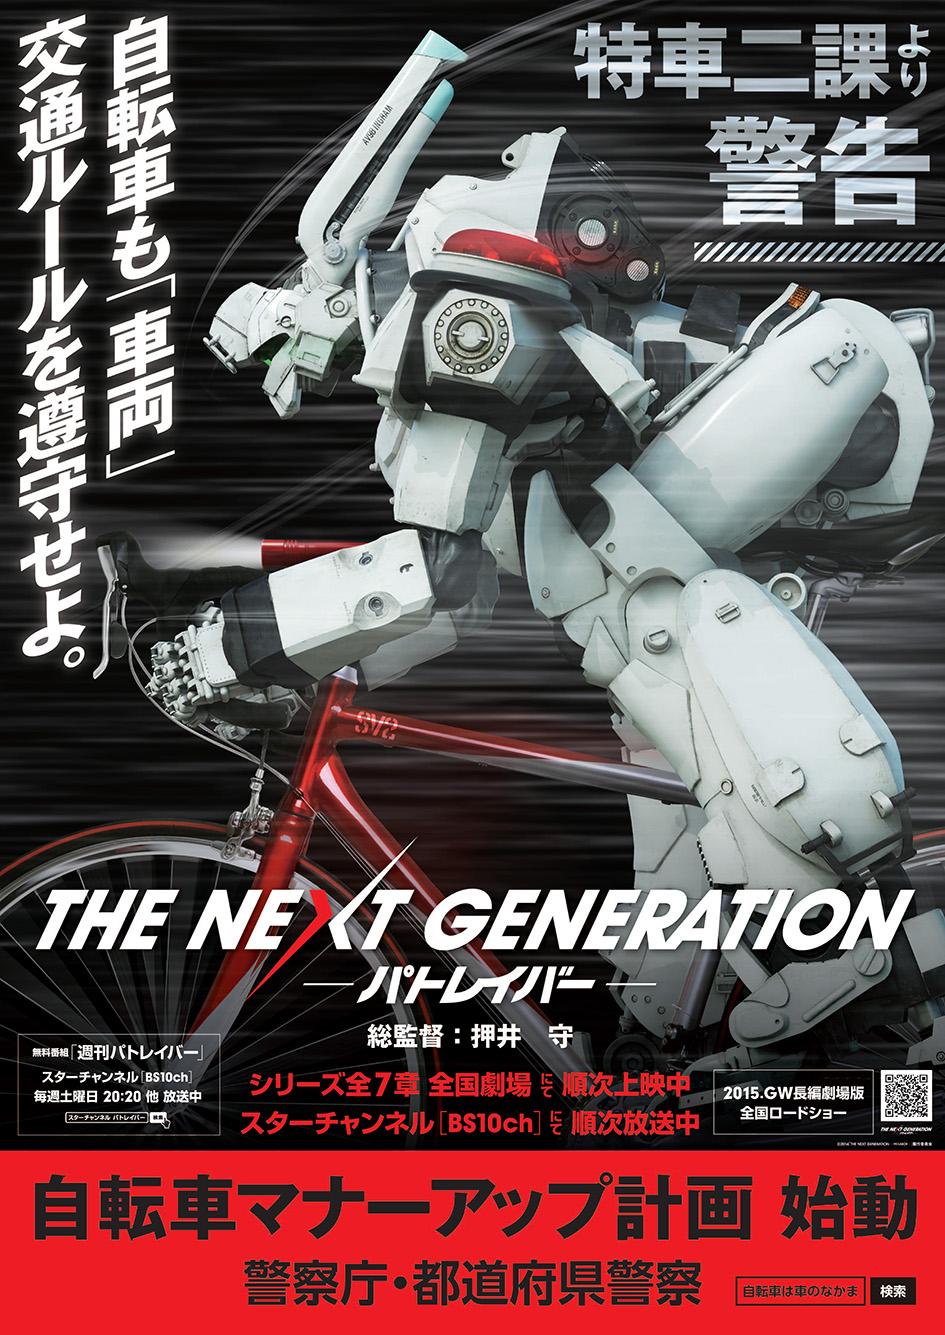 『THE NEXT GENERATION パトレイバー』×警察庁  コラボレーション第2弾 「自転車月間」マナーアップポスターを全国展開!